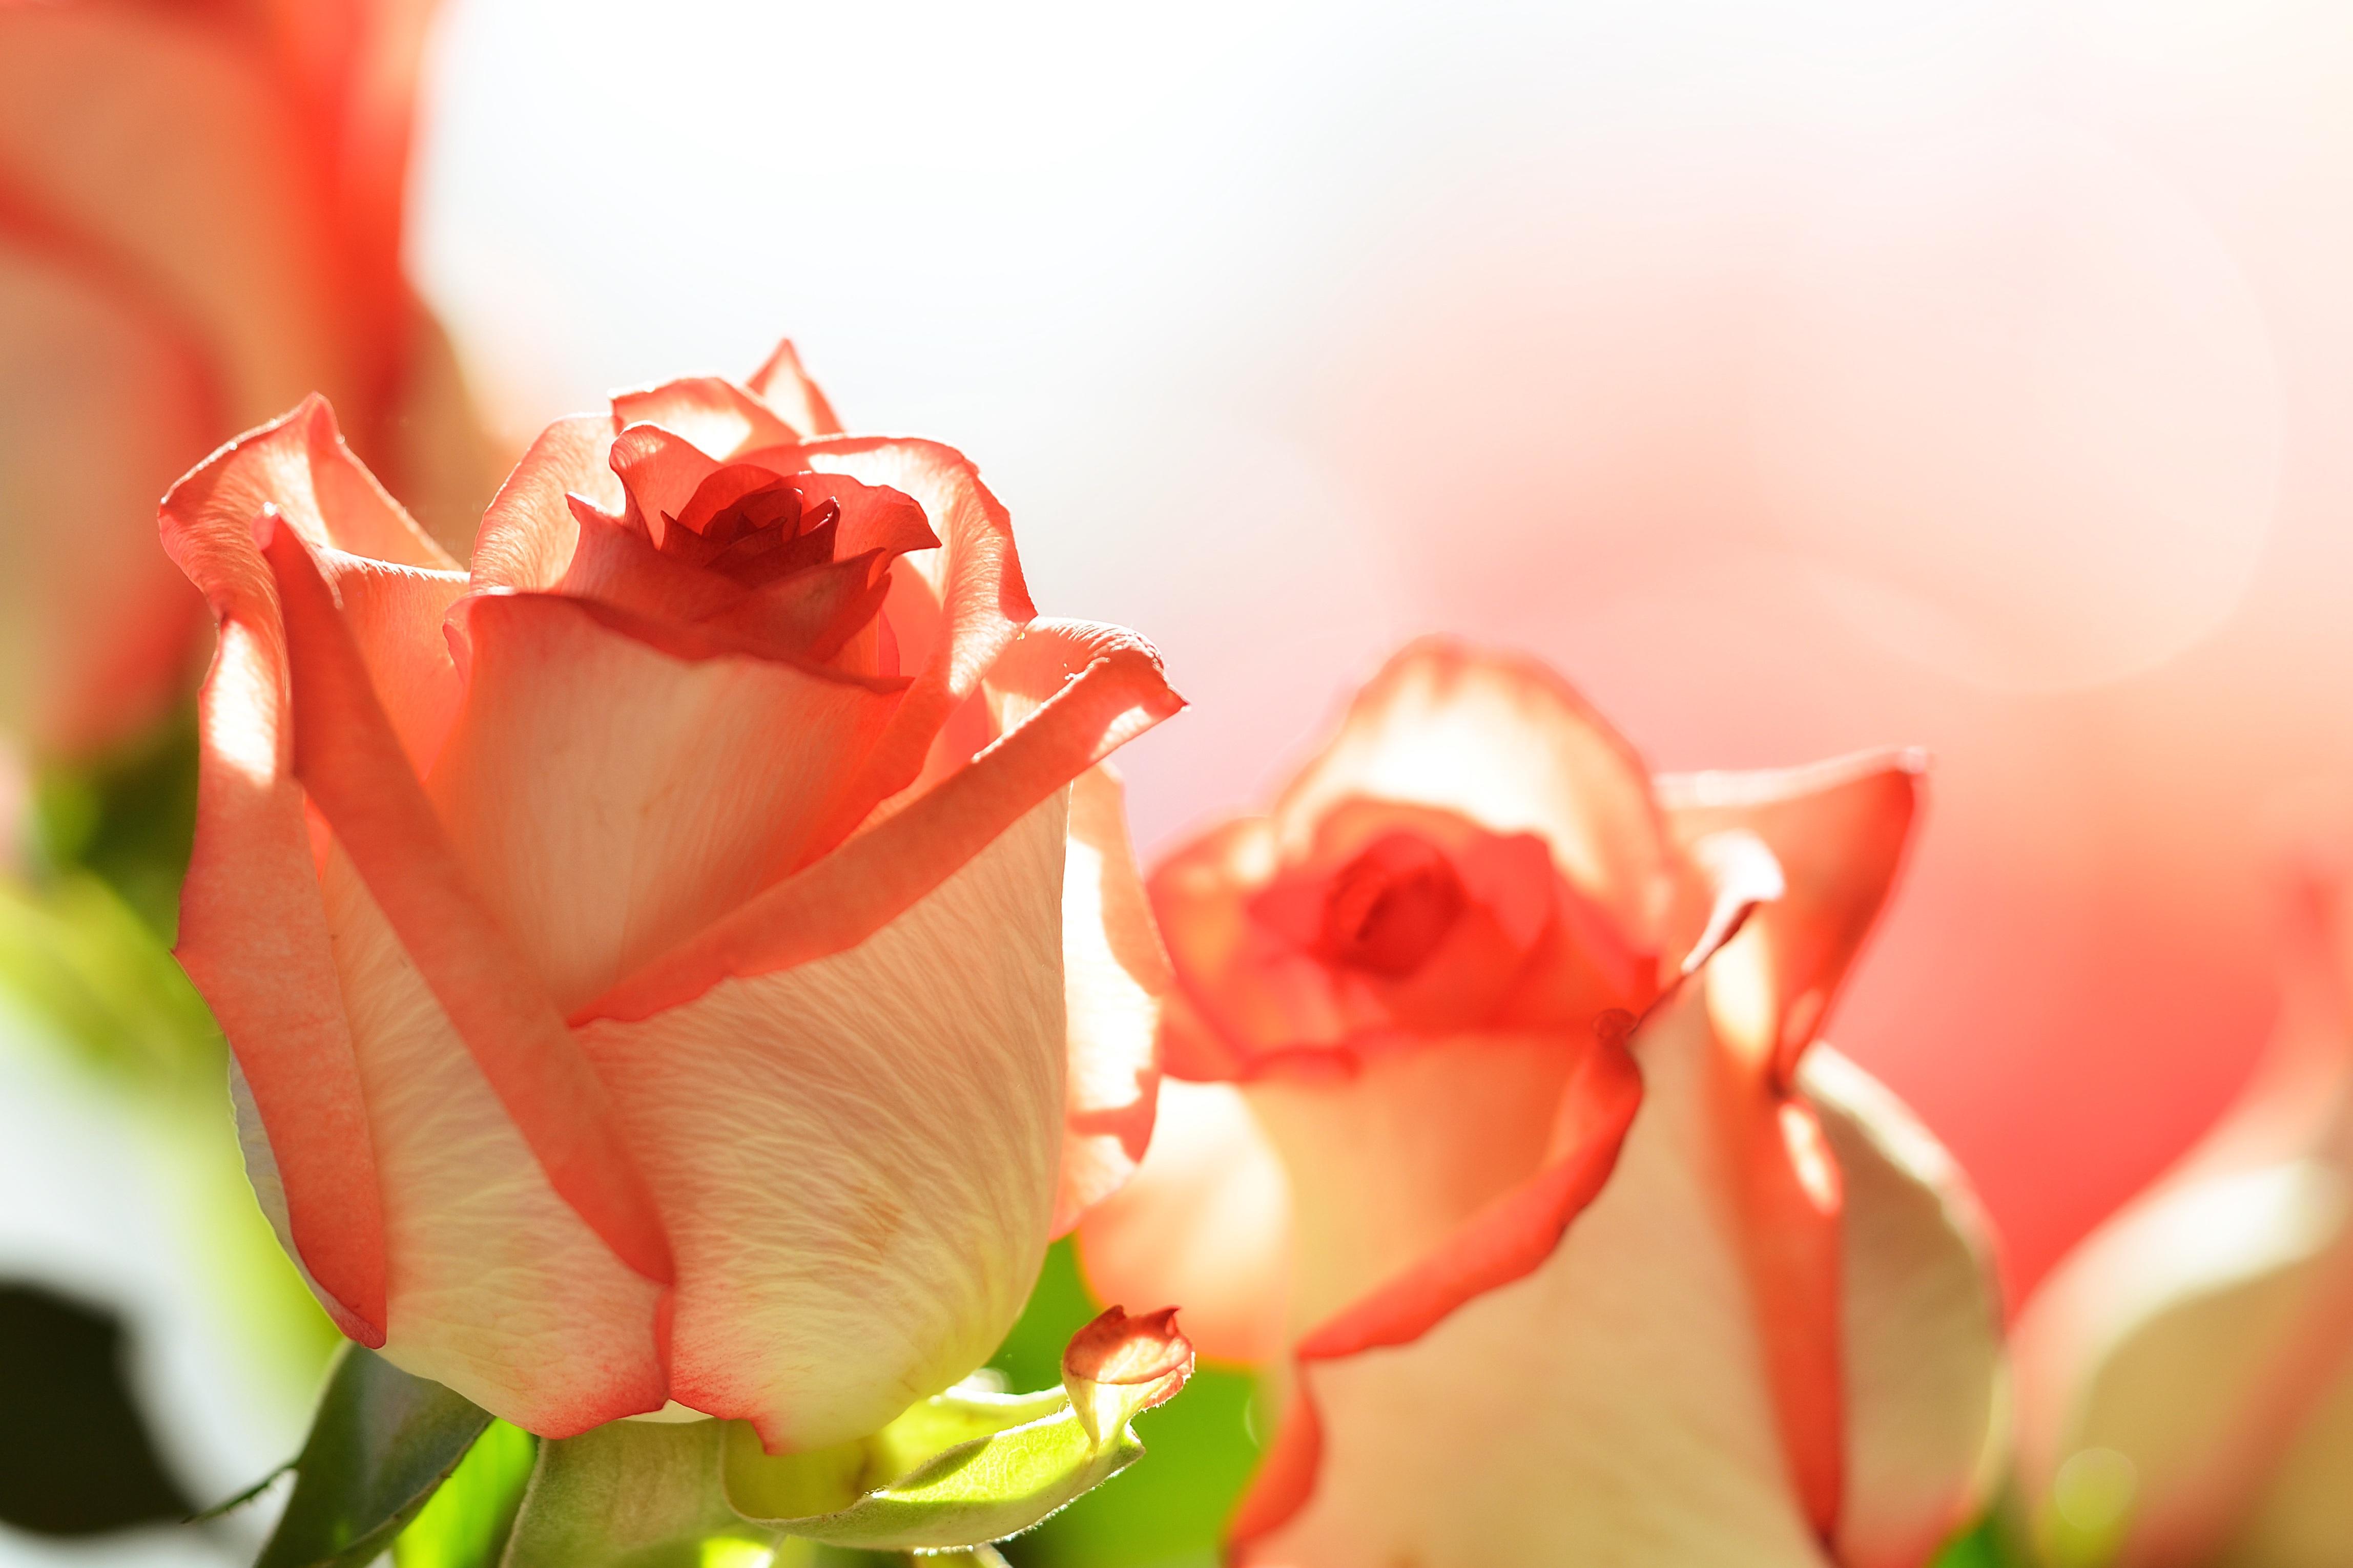 Flores para San Valentín - 4592x3061